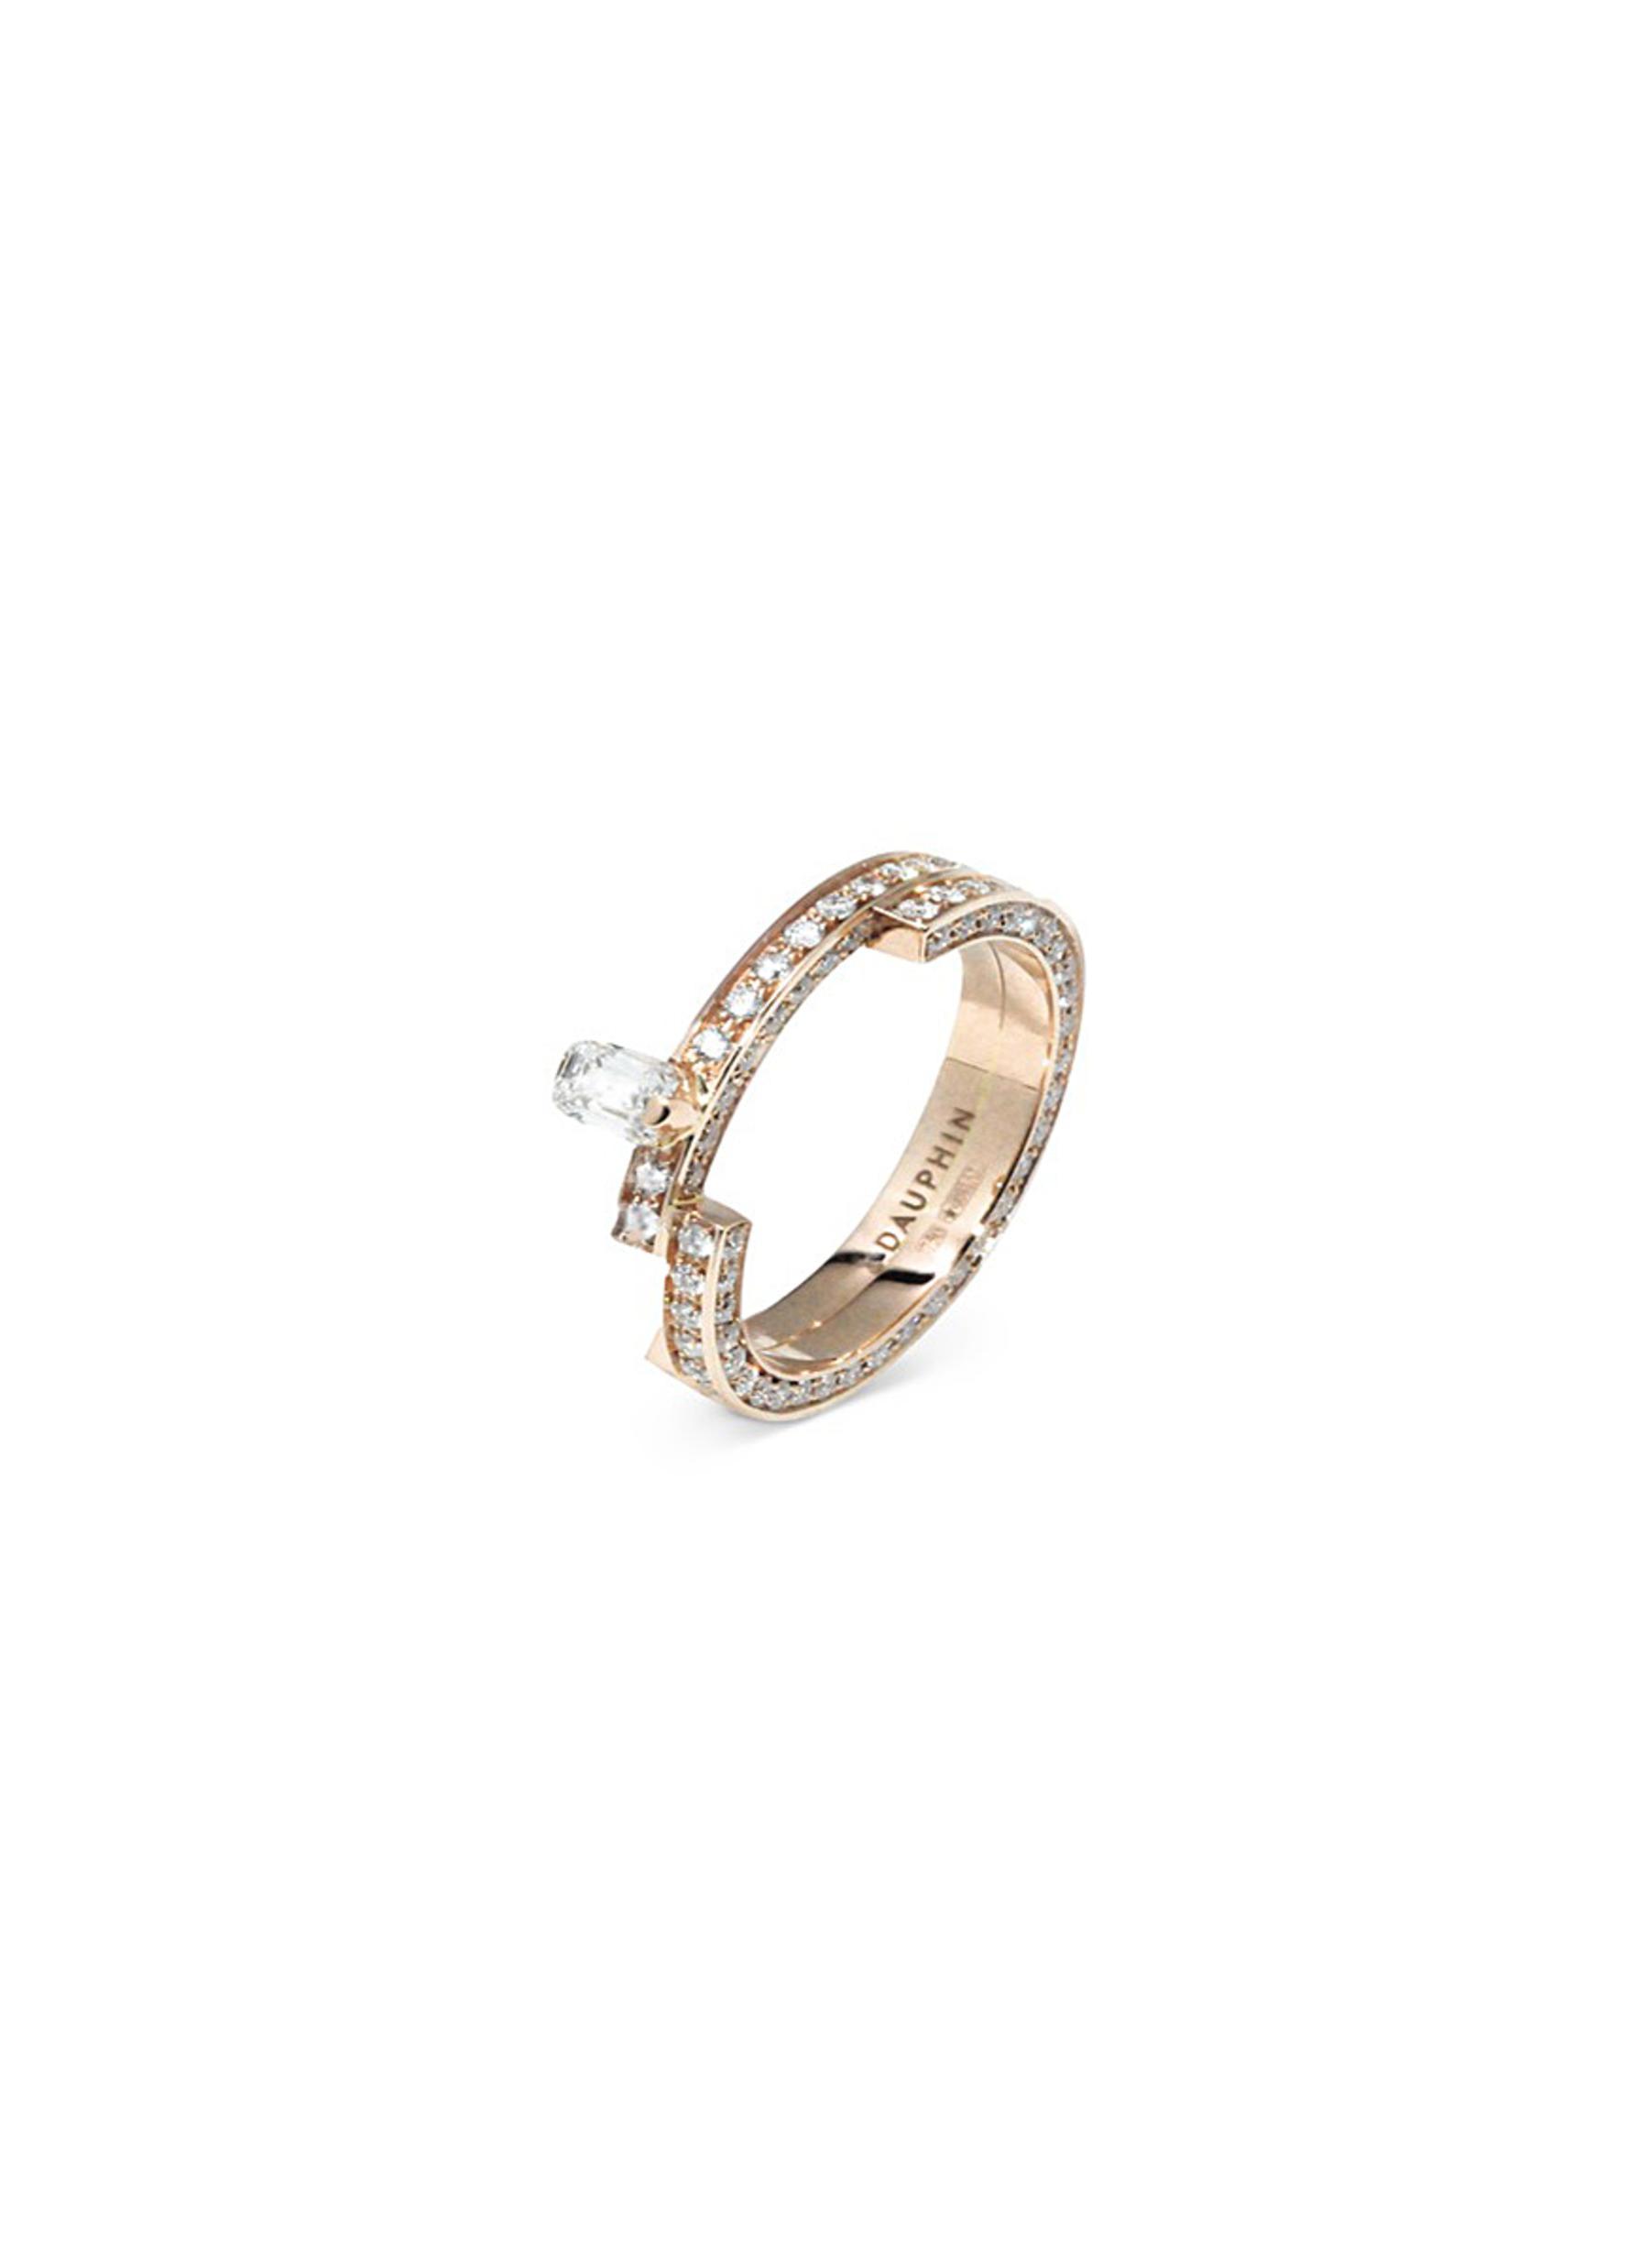 'Disruptive' pavé diamond 18k rose gold two tier ring